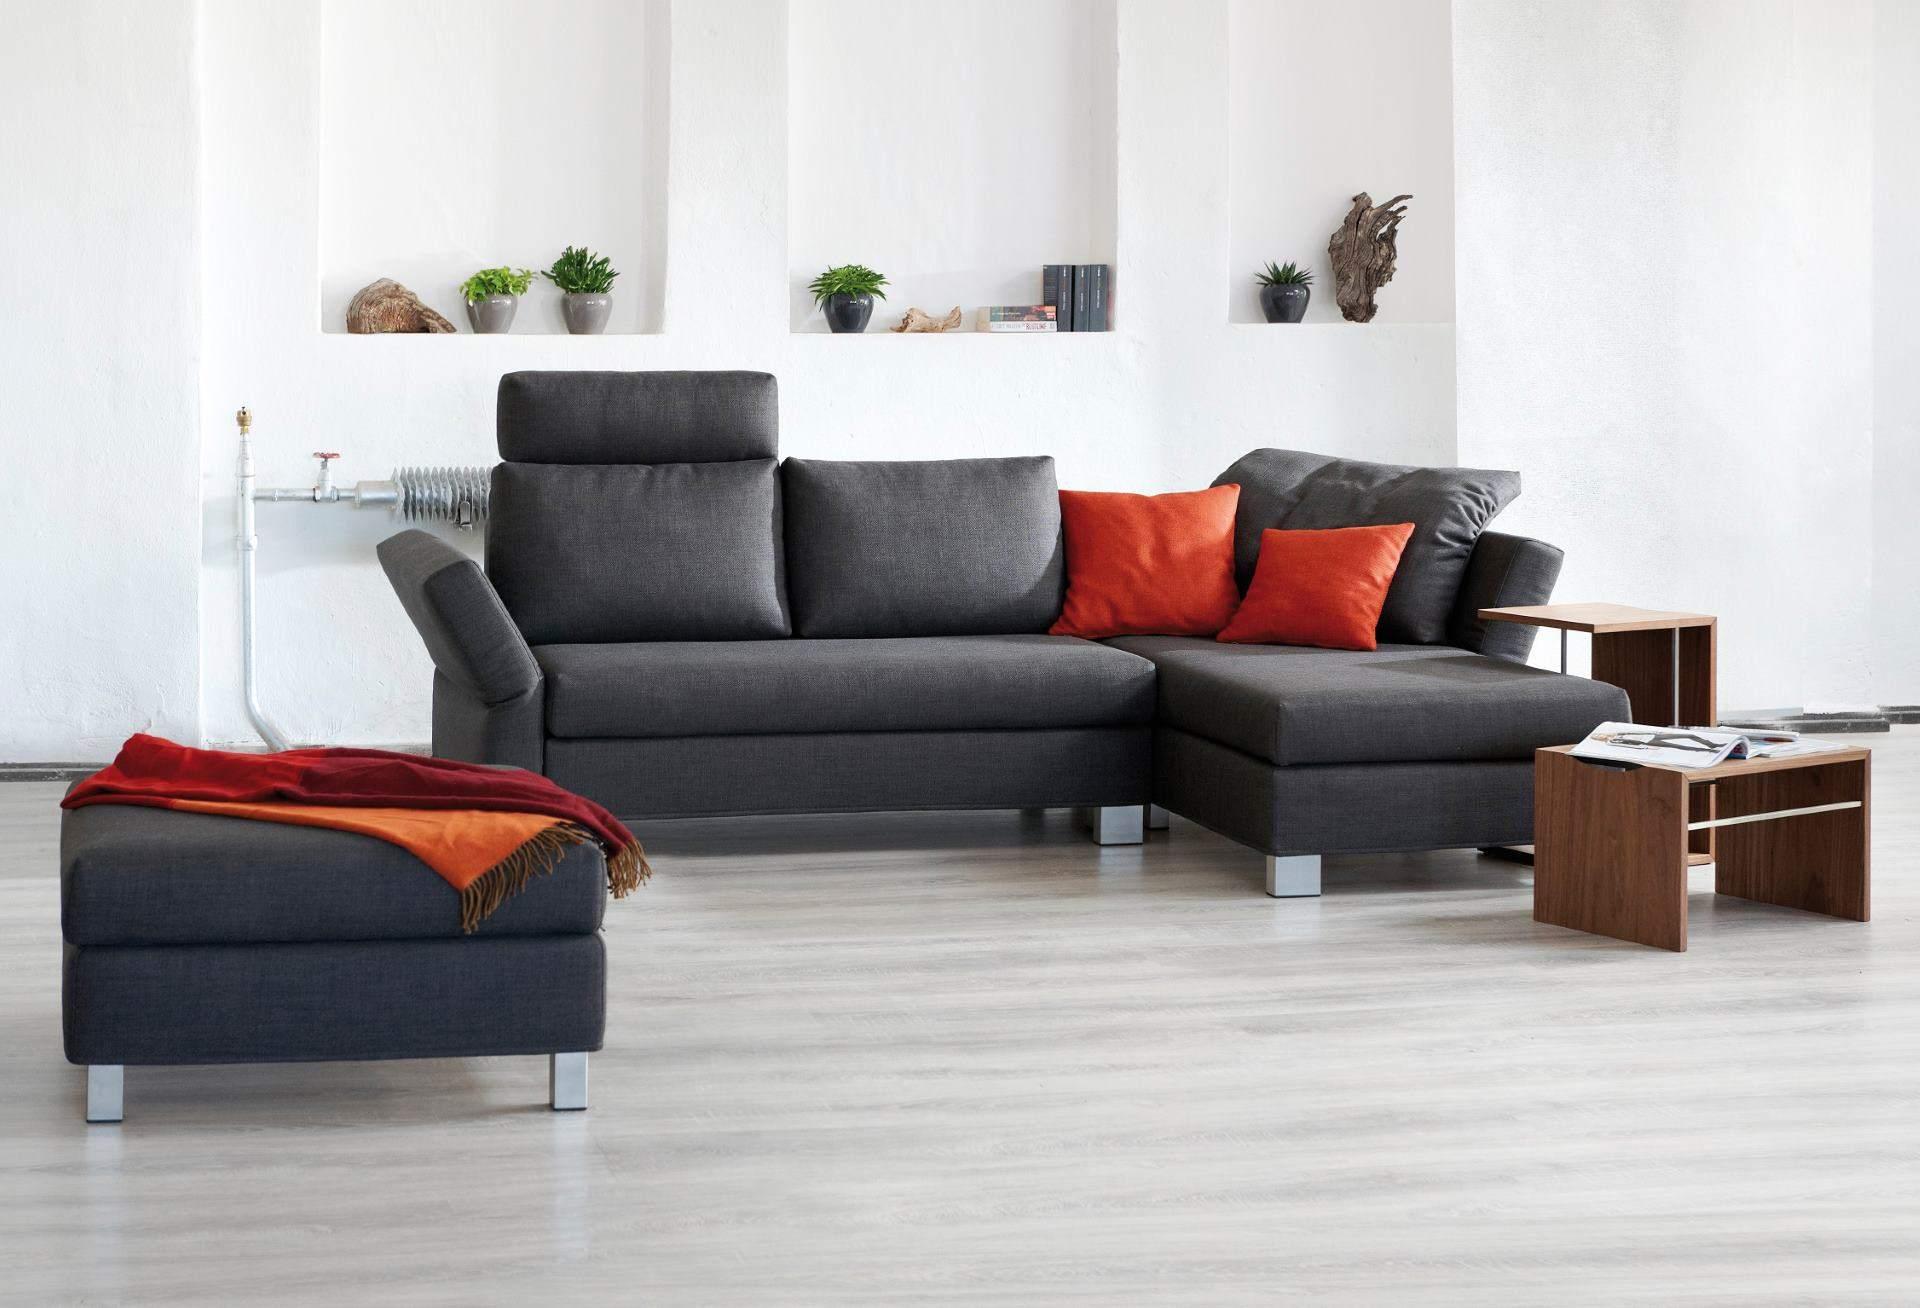 schlafsofa fr jugendliche affordable schlafsofa ferryhill. Black Bedroom Furniture Sets. Home Design Ideas